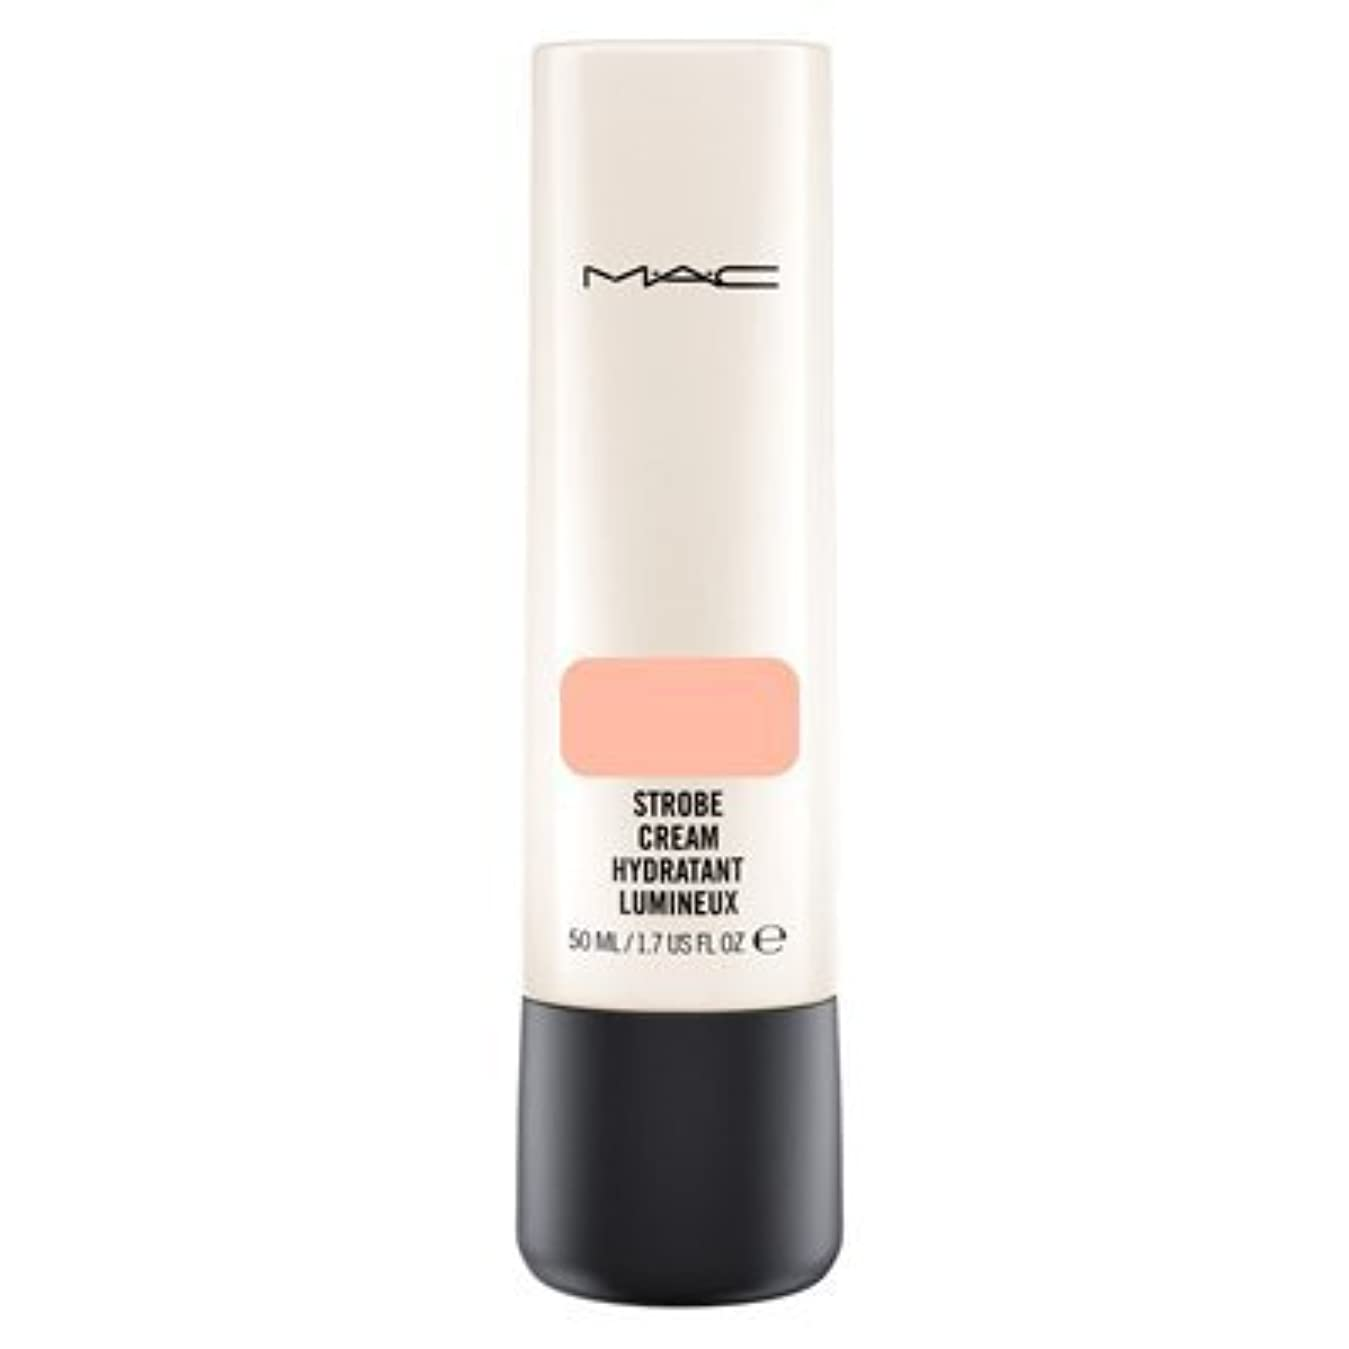 MAC (マック) ストロボ クリーム ピーチ ライト/Peach Light 50ml [並行輸入品]